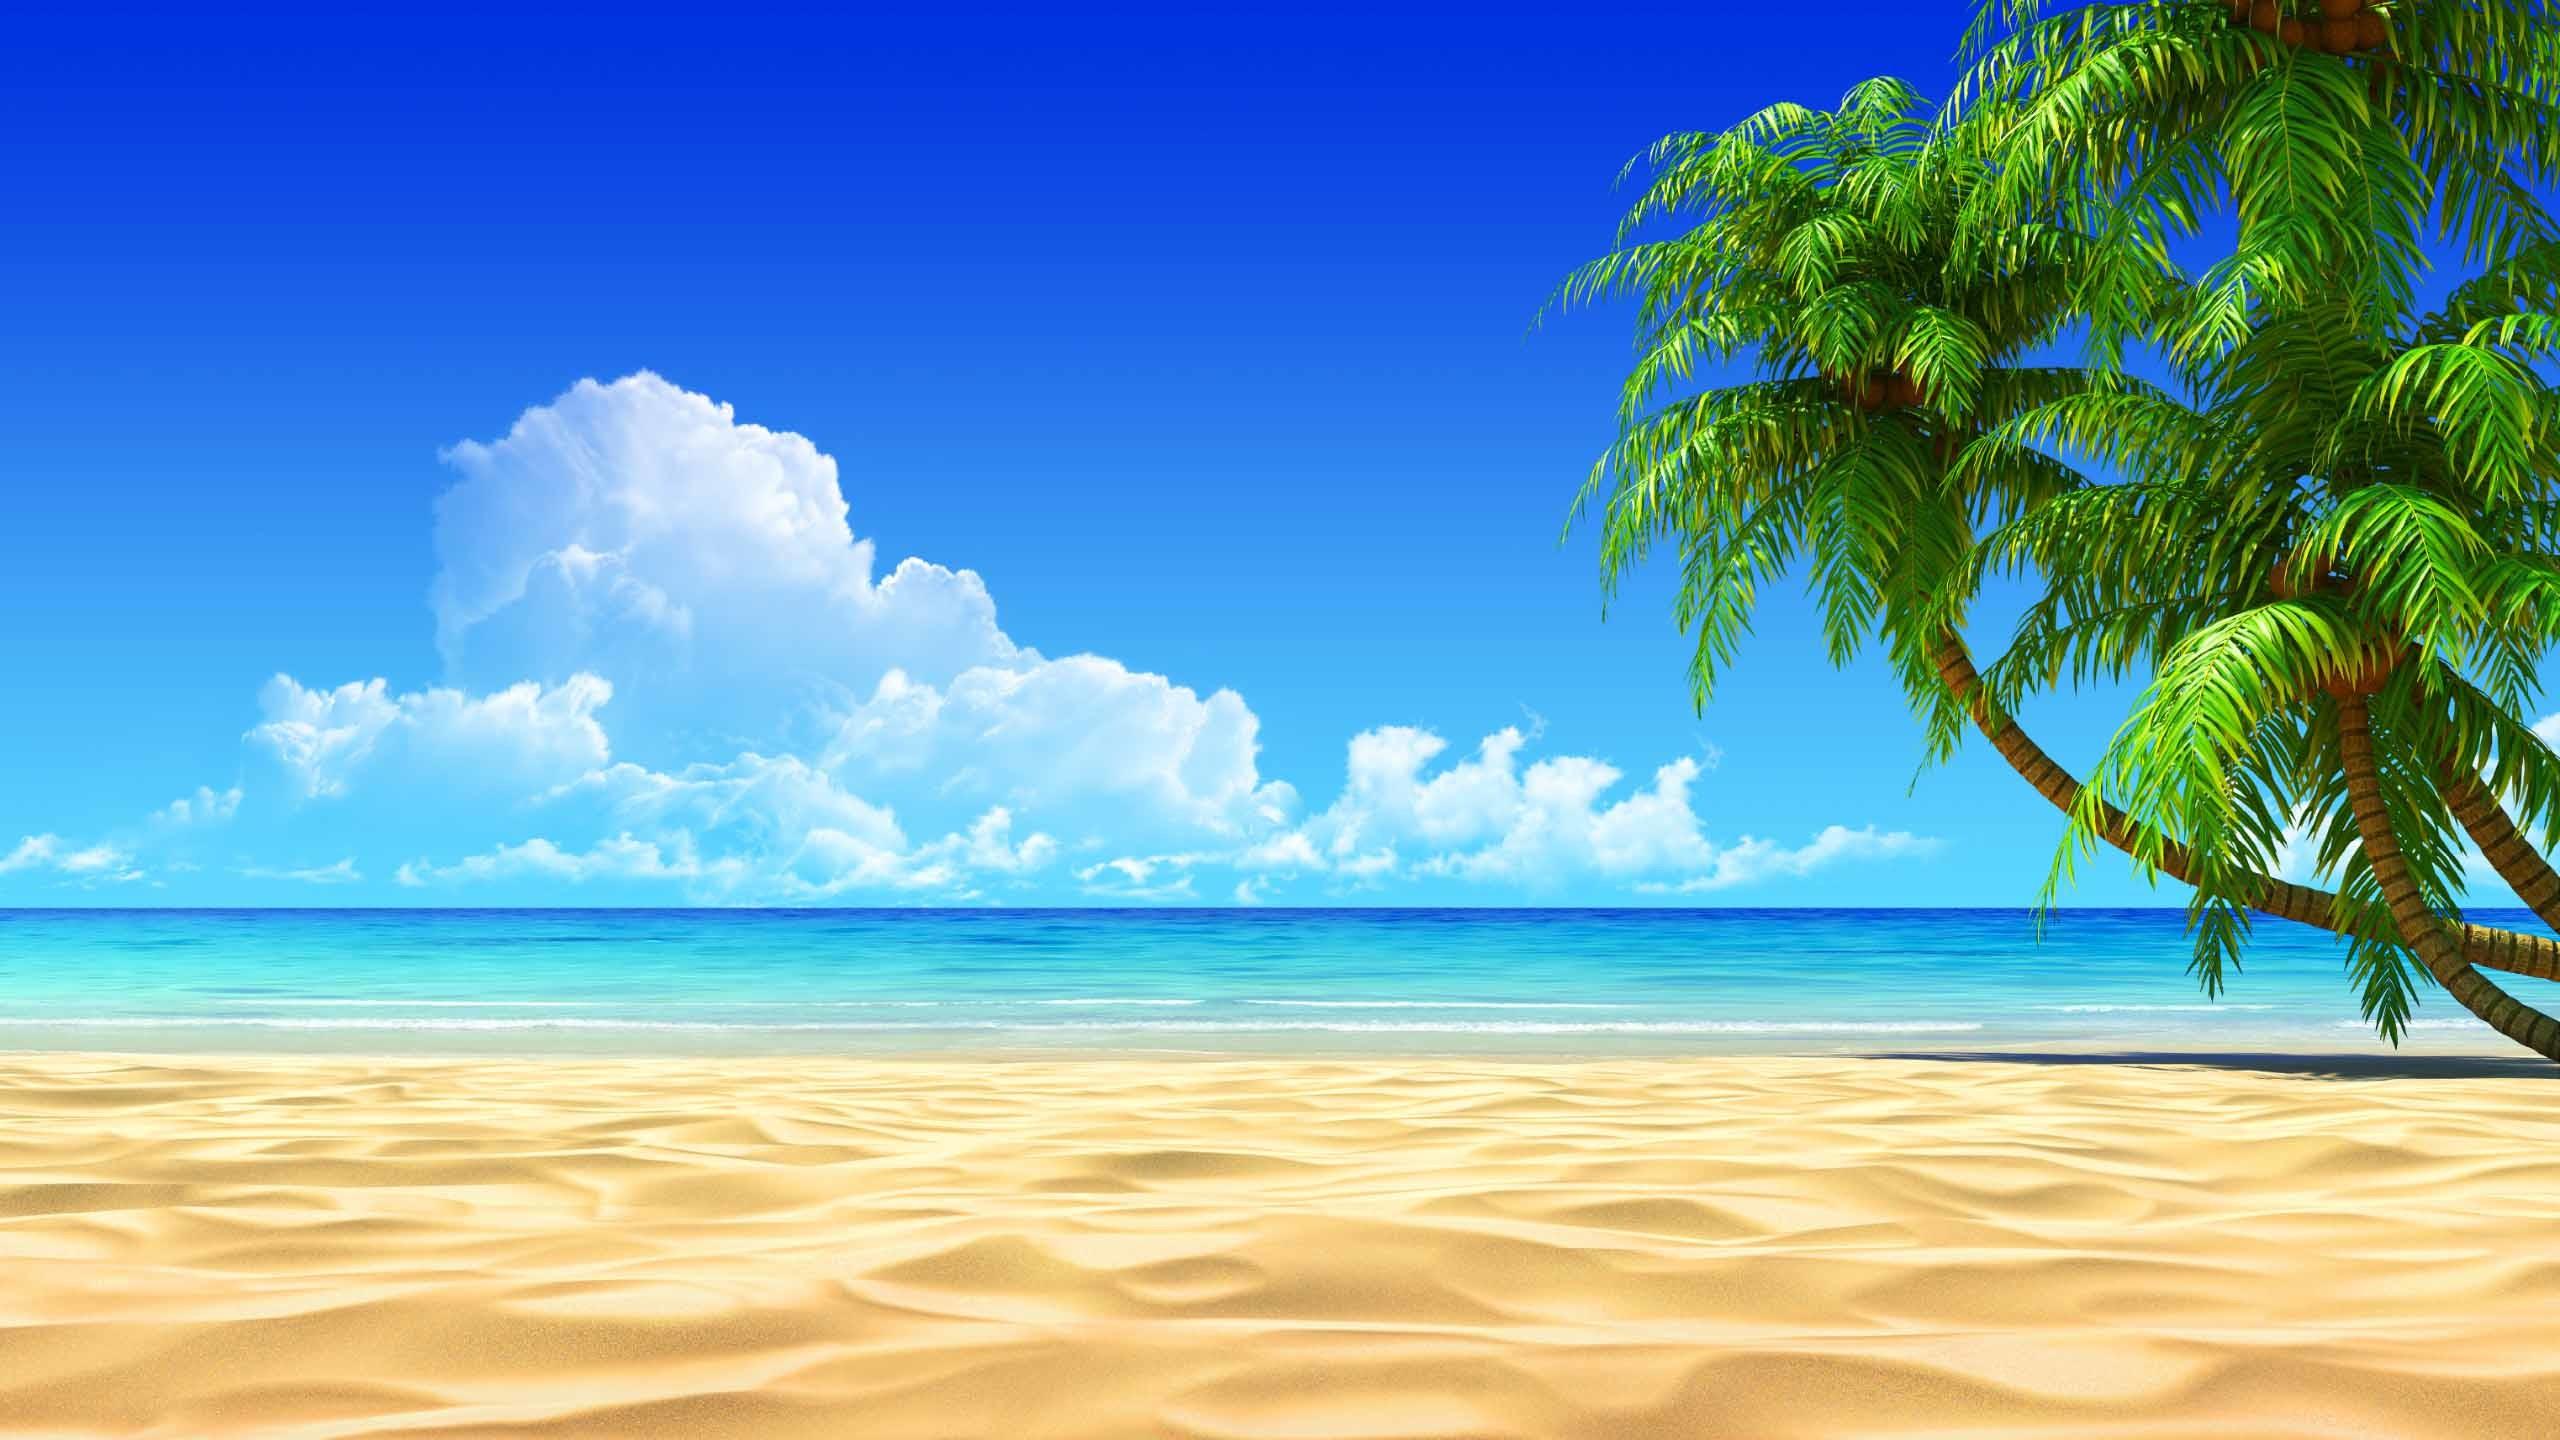 Panoramic Beach Wallpapers Full HD